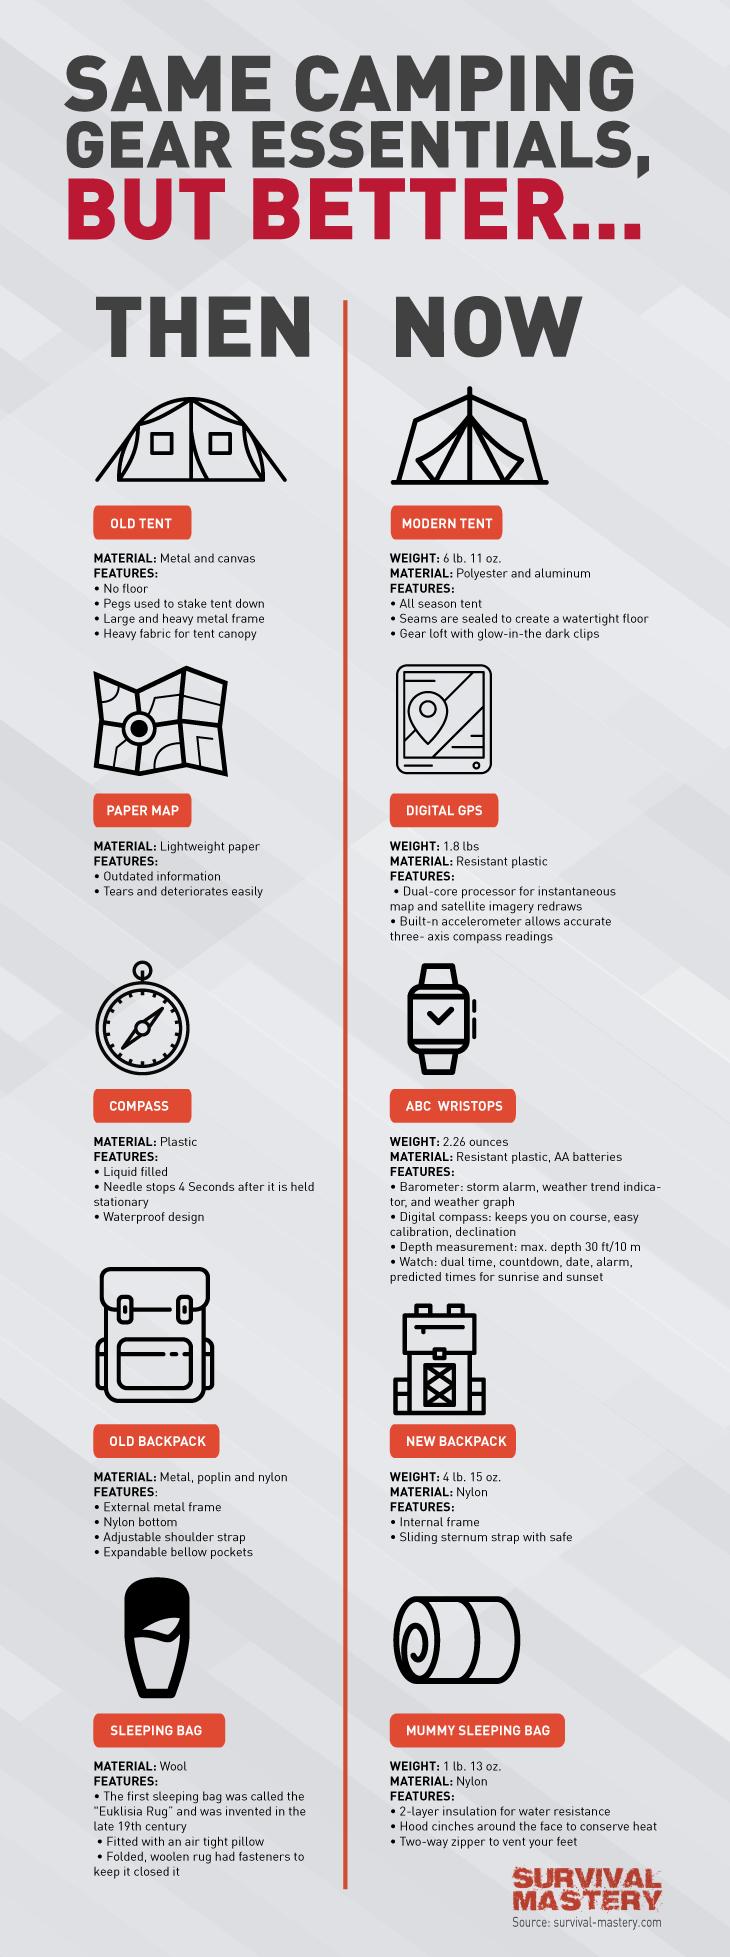 Camping essentials infographic